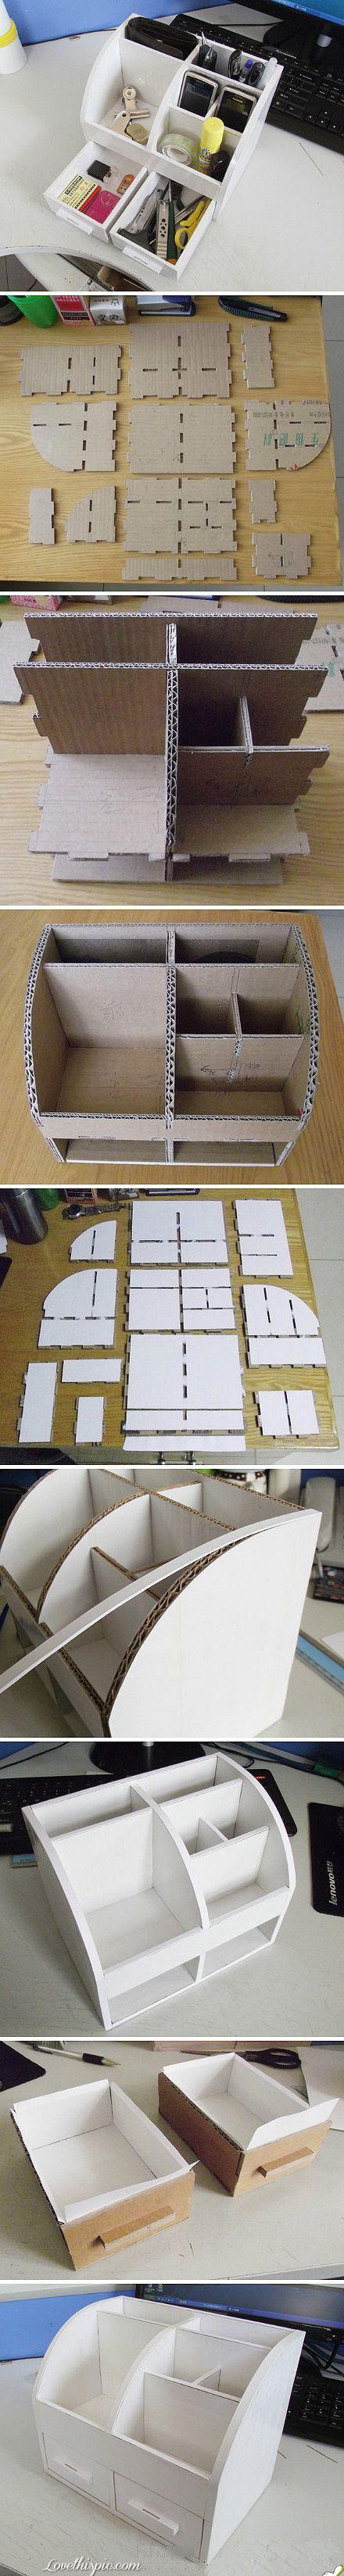 DIY Cardboard Organizer - something to satisfy my need for destruction if nothing else